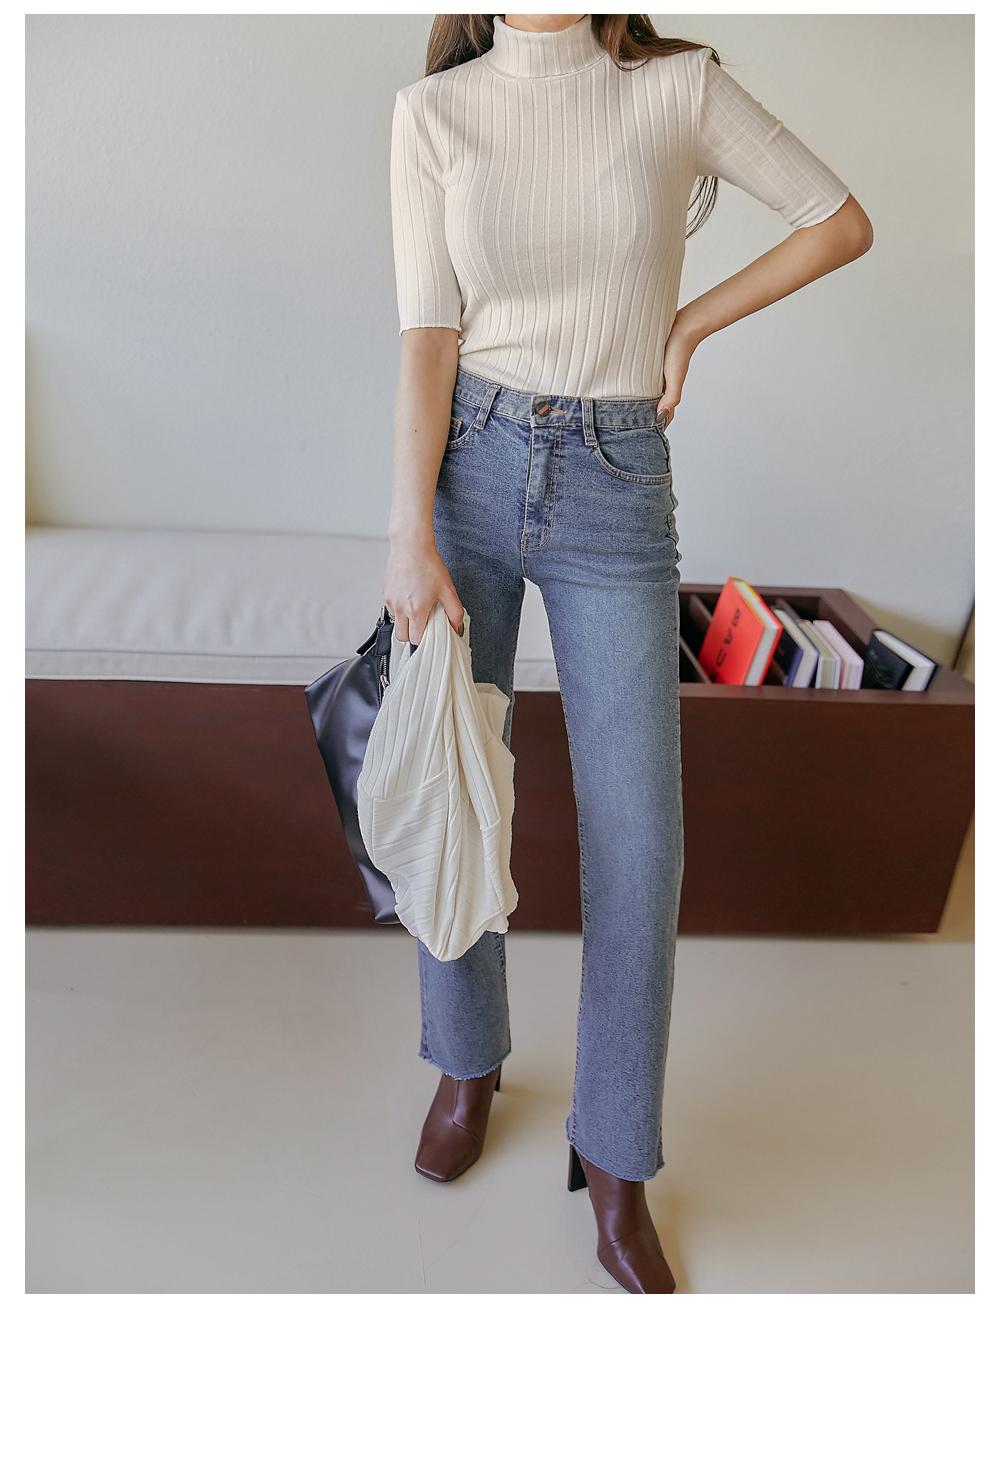 dress model image-S1L47